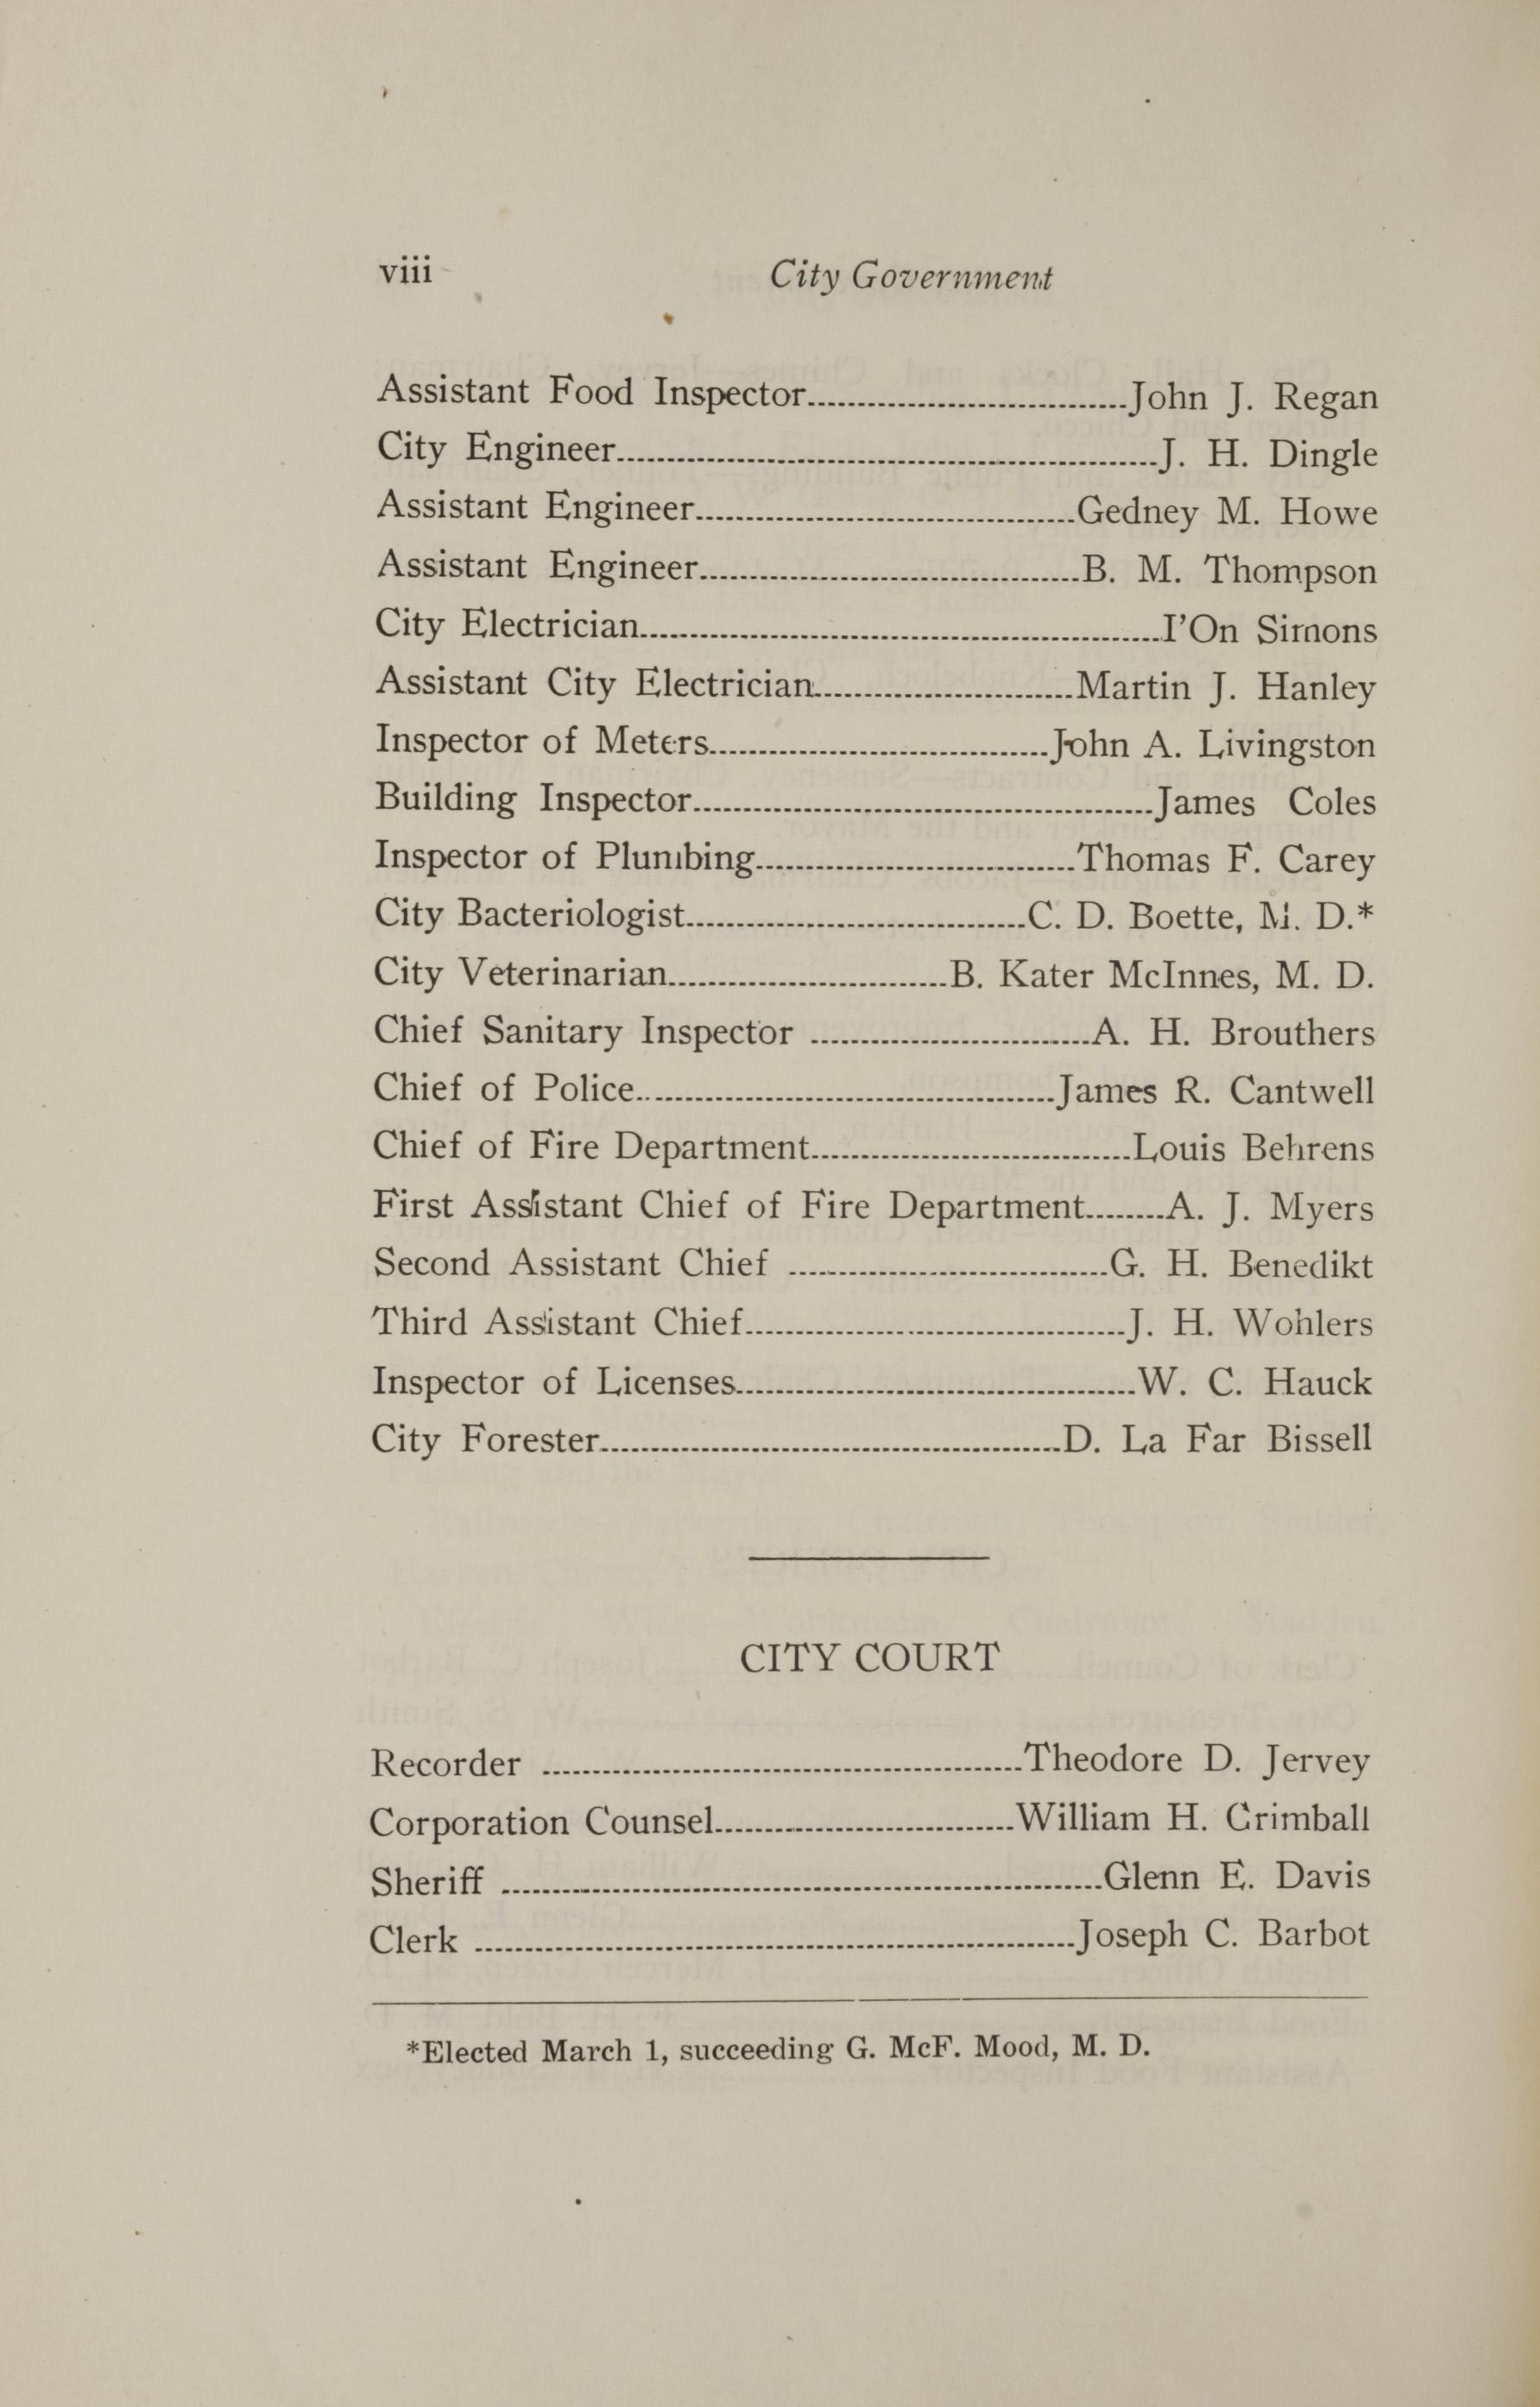 Charleston Yearbook, 1921, page viii